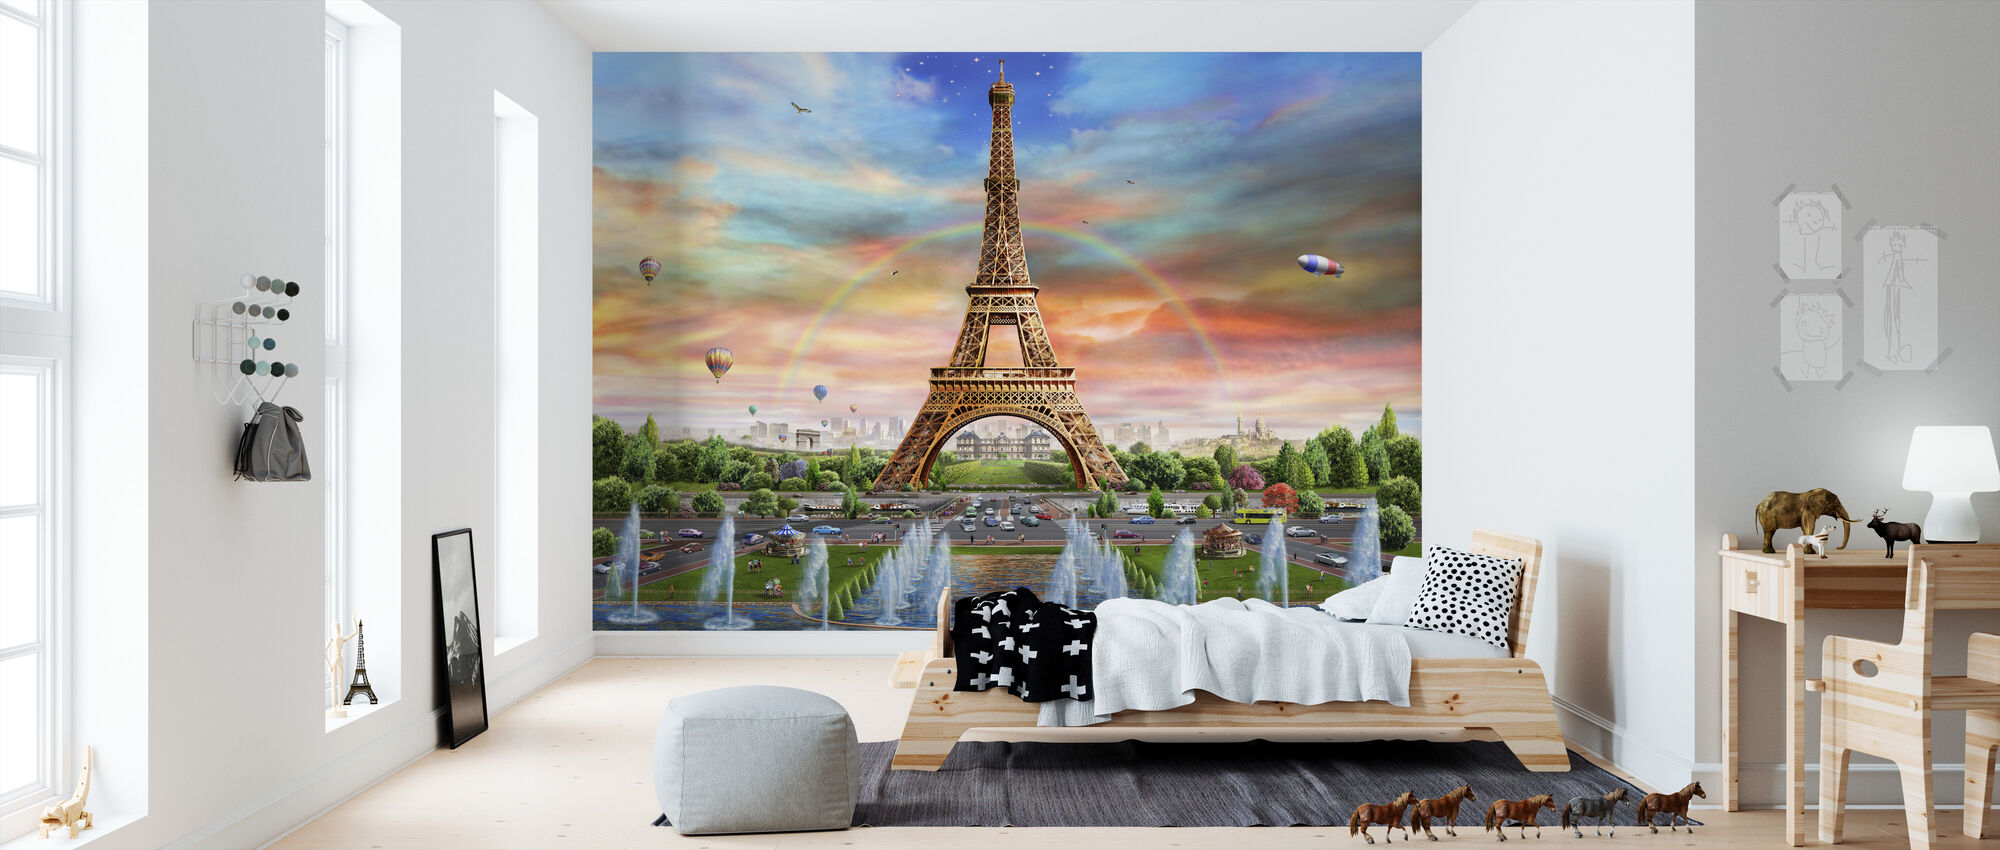 Eiffel Tower - Wallpaper - Kids Room